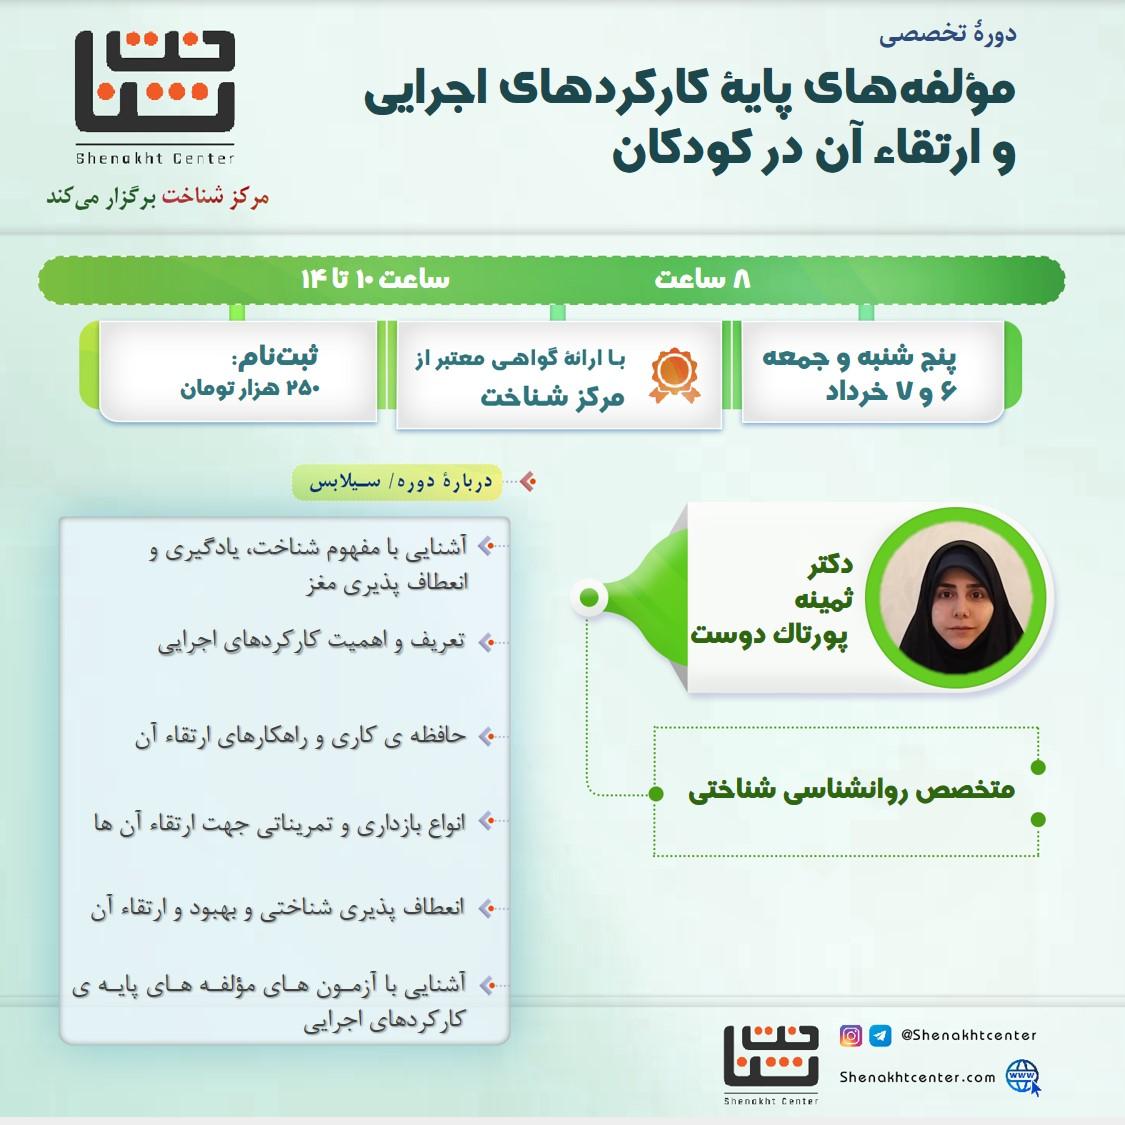 کارگاه-خرداد-دکتر-پورتاک-دوست.jpg